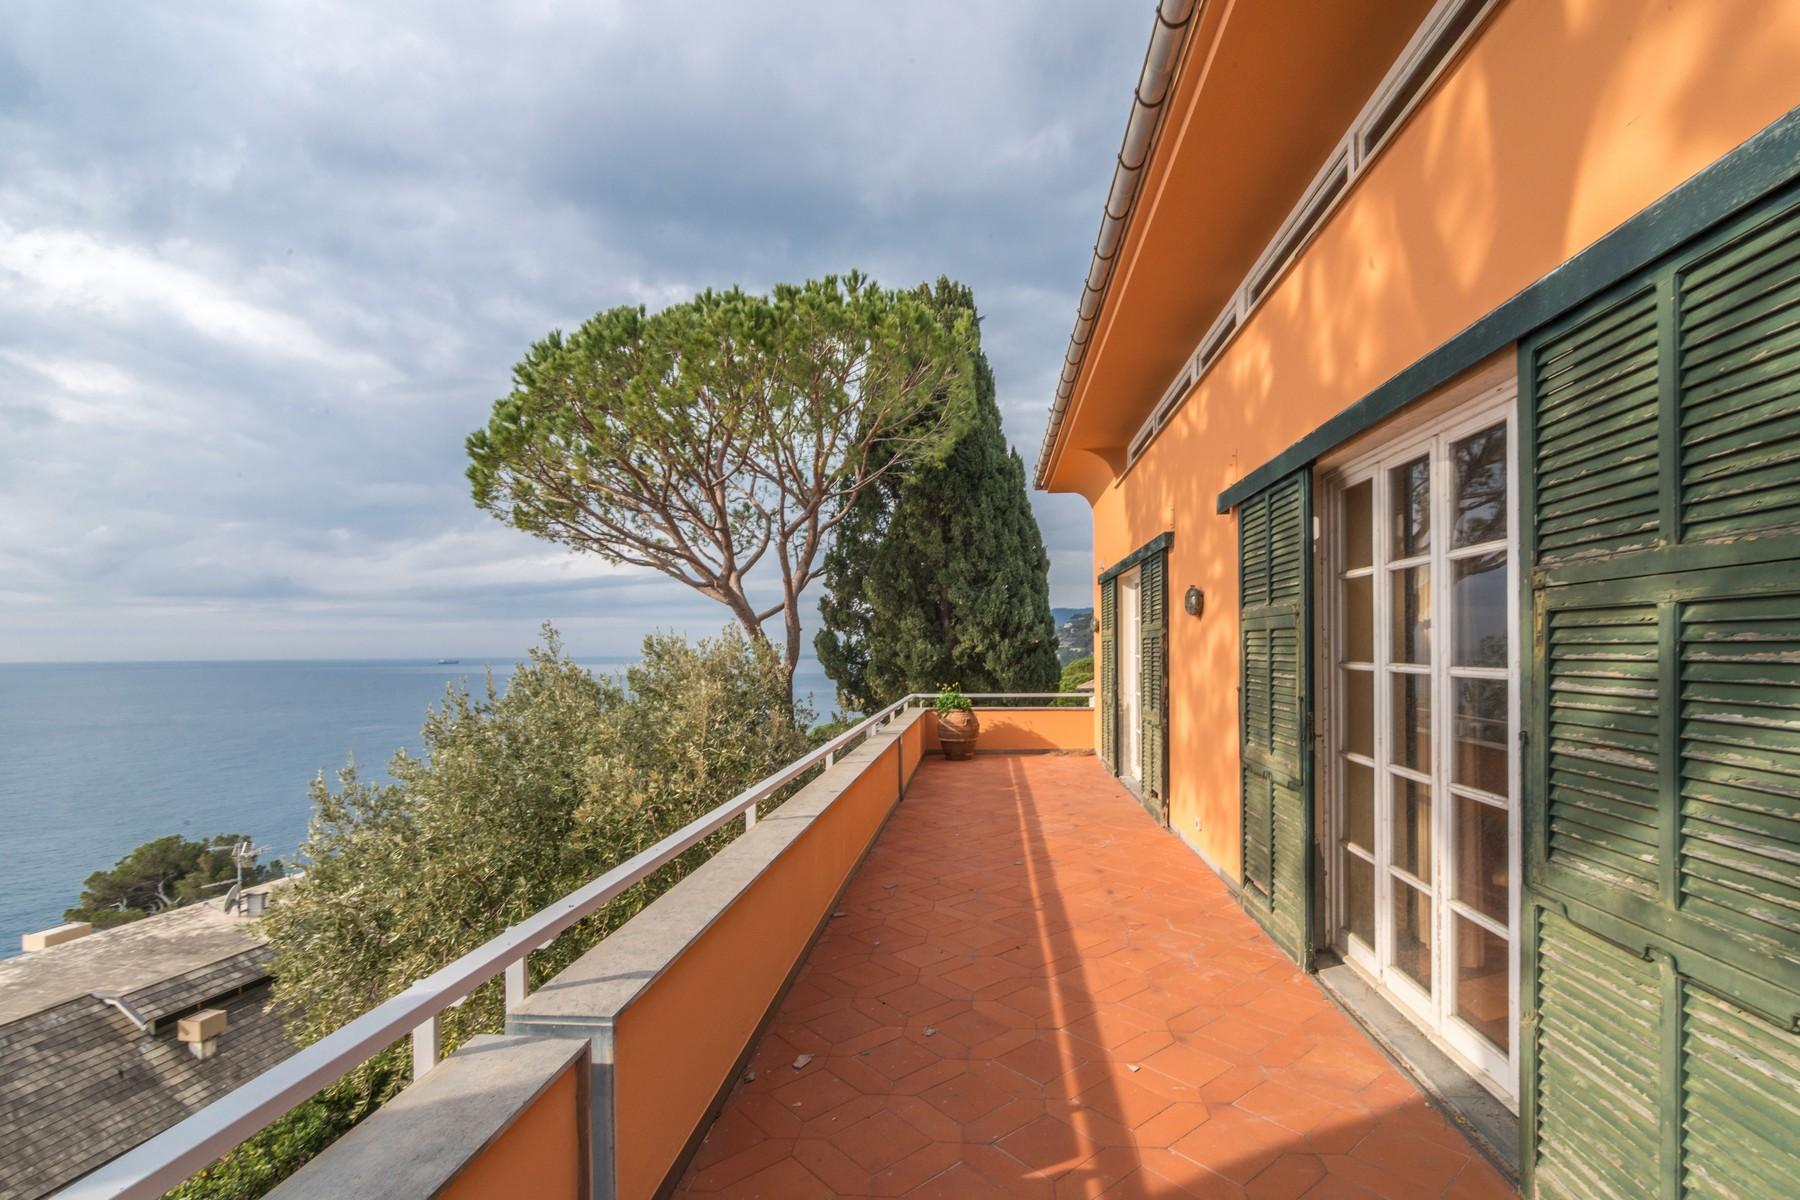 Villa in Vendita a Sori: 5 locali, 720 mq - Foto 7